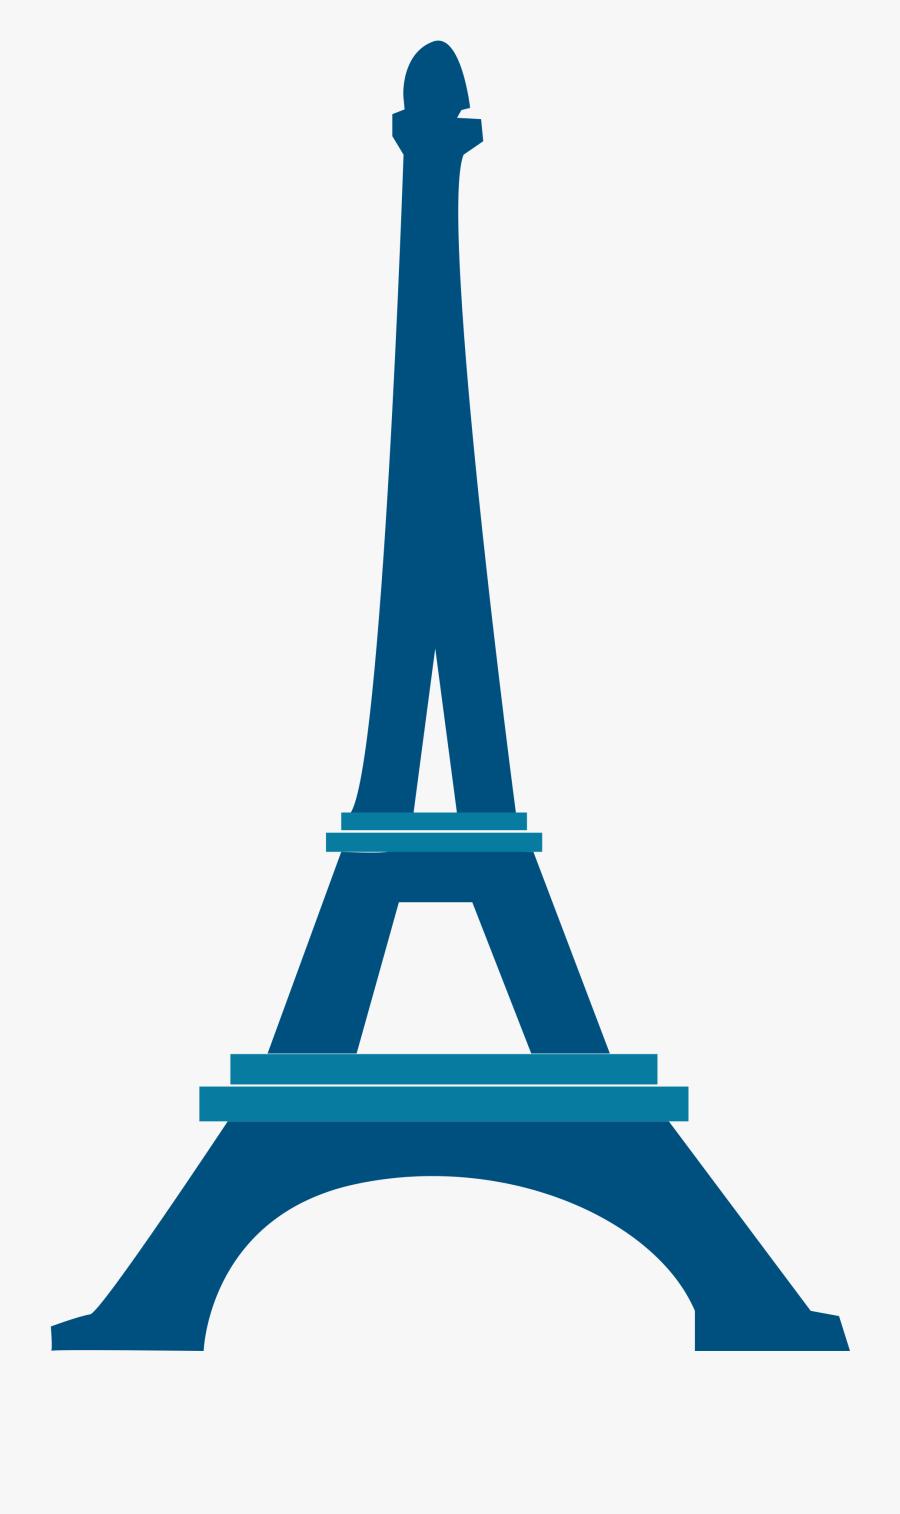 Eiffel Tower Icons - Eiffel Tower Adobe Illustrator, Transparent Clipart